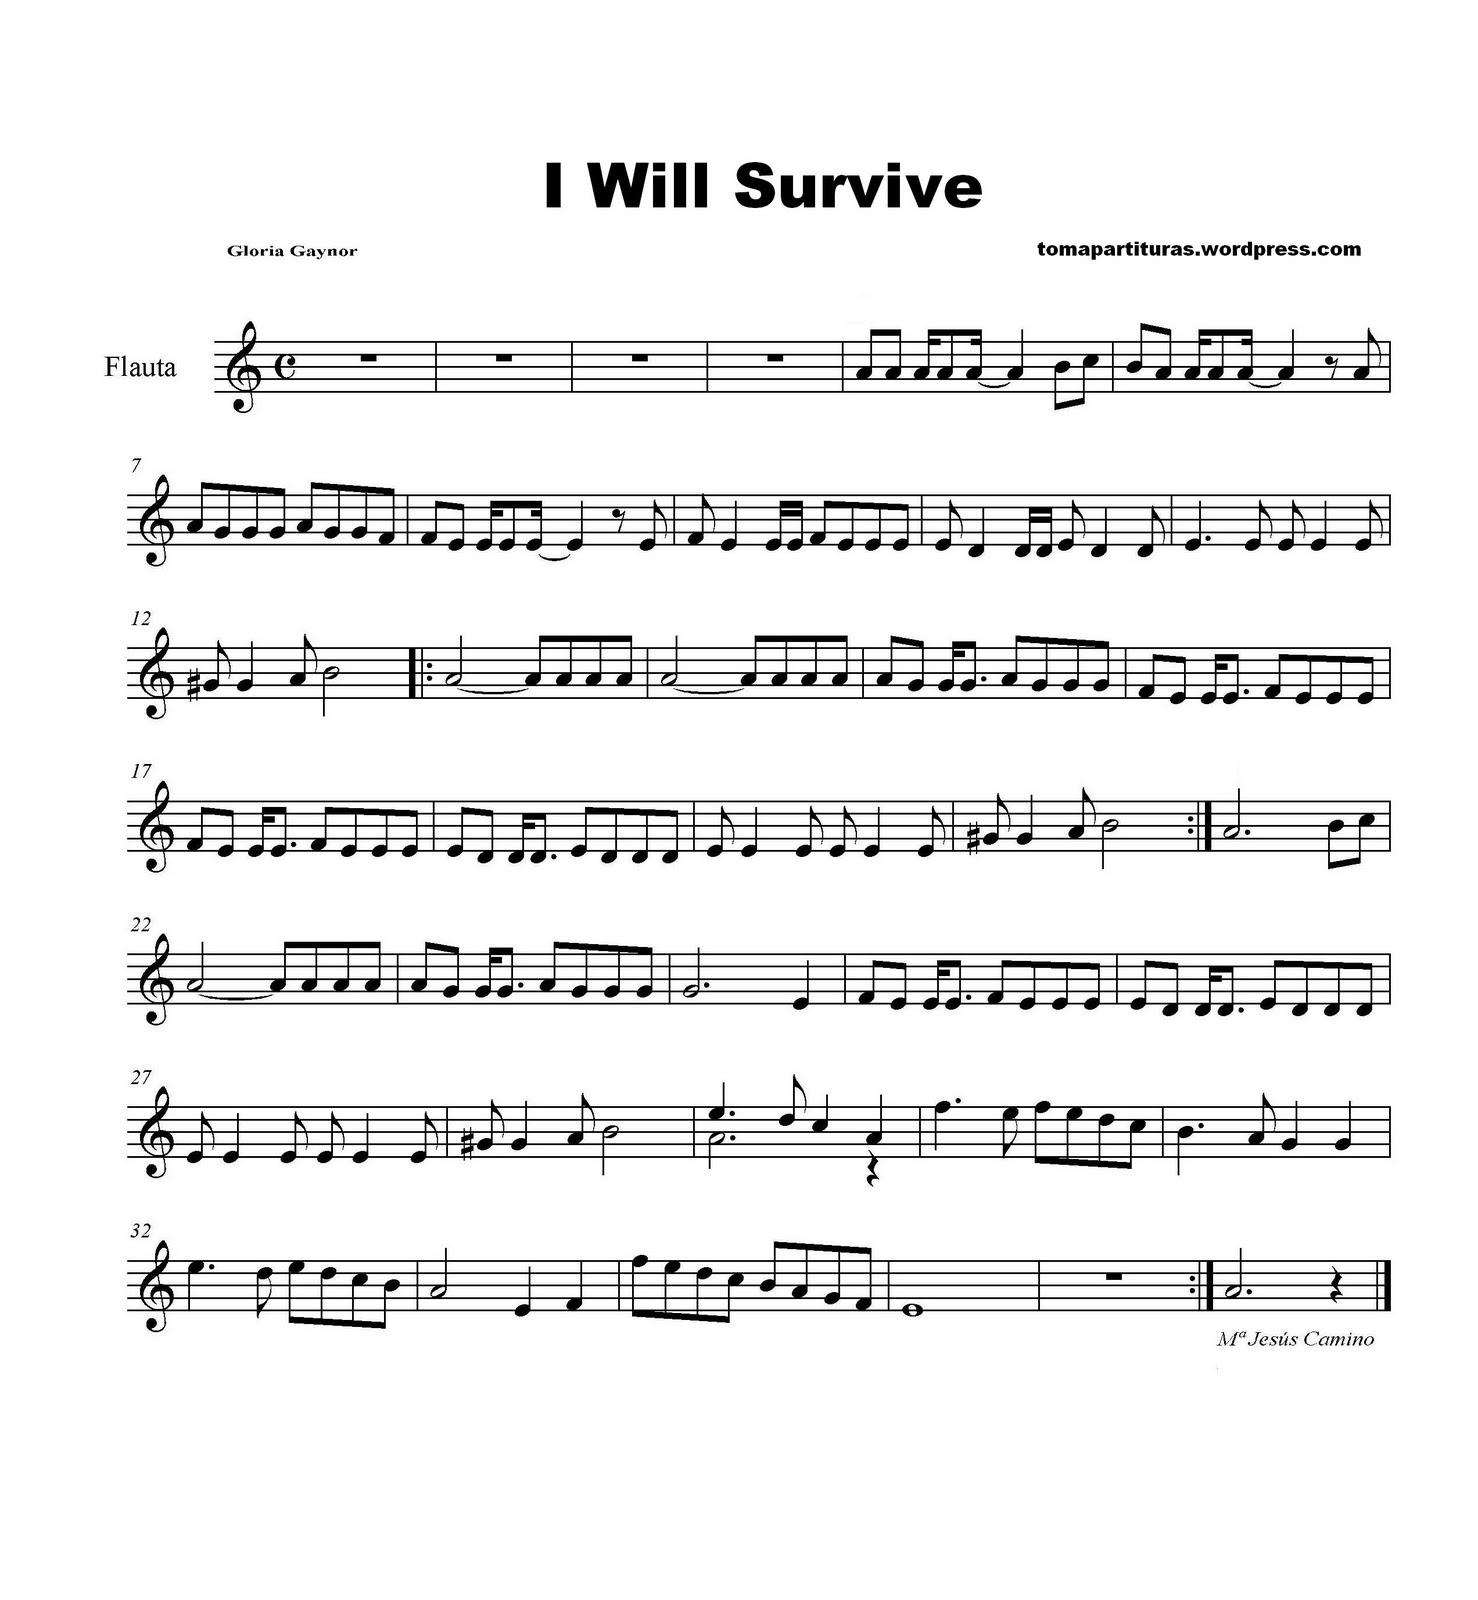 Notas d r mix partituras Notas de espectaculos mas recientes